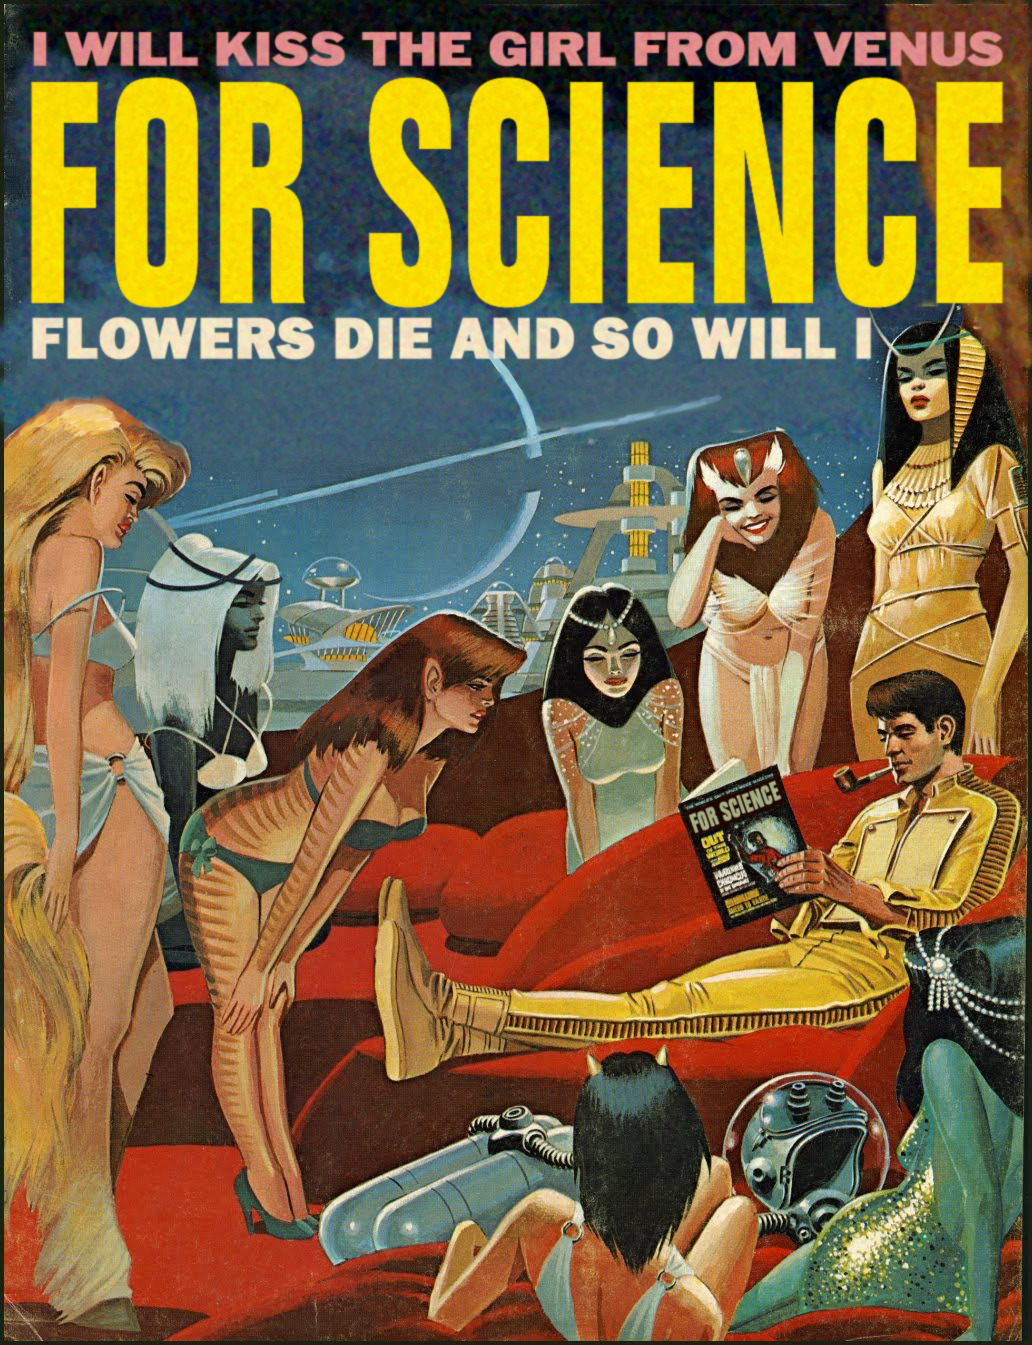 didi for science.jpg